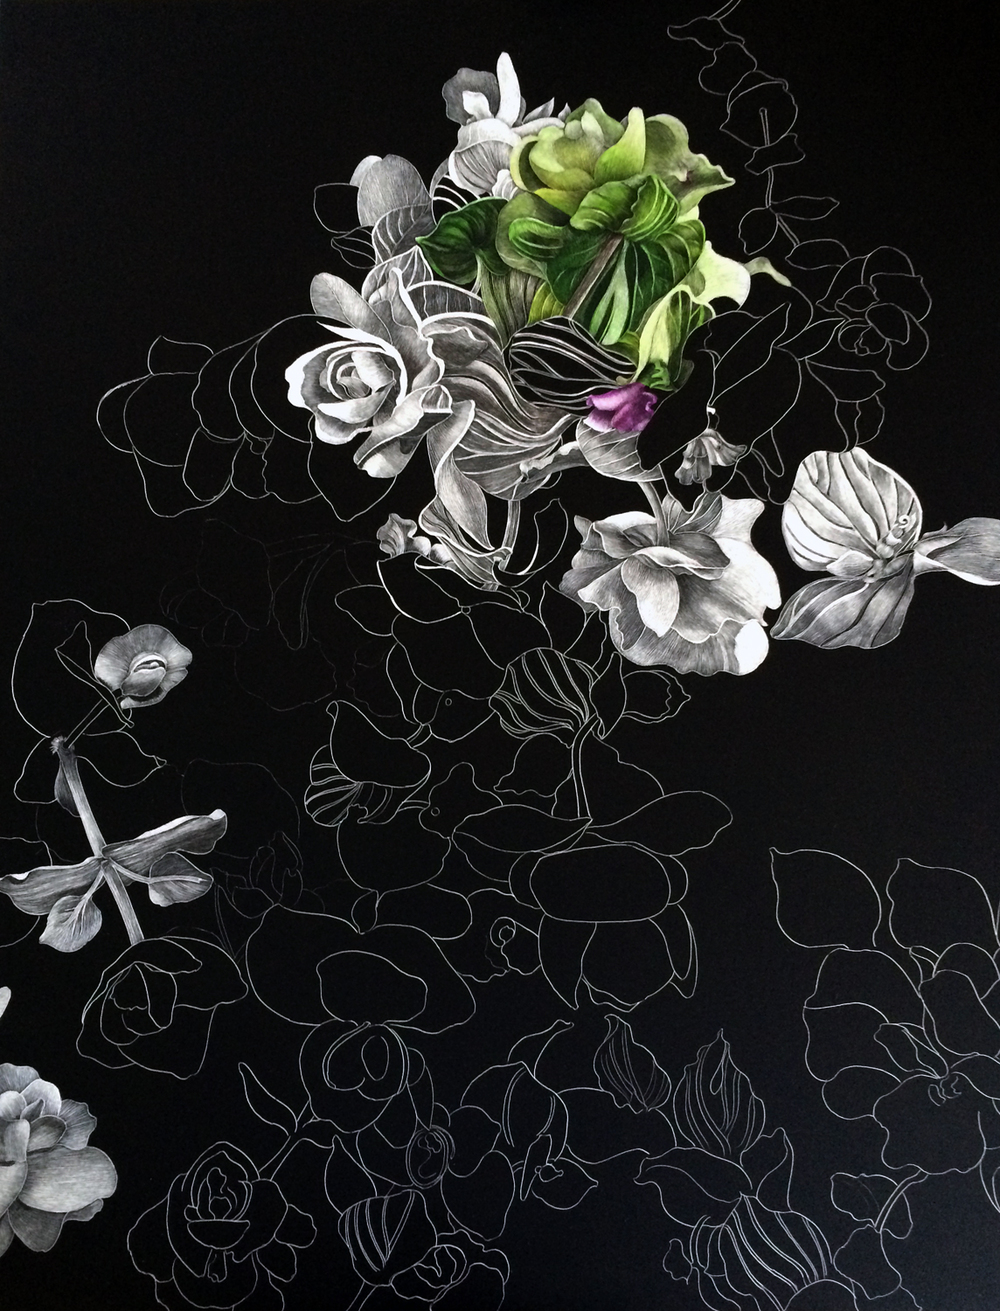 Oregano by Lisa Goesling